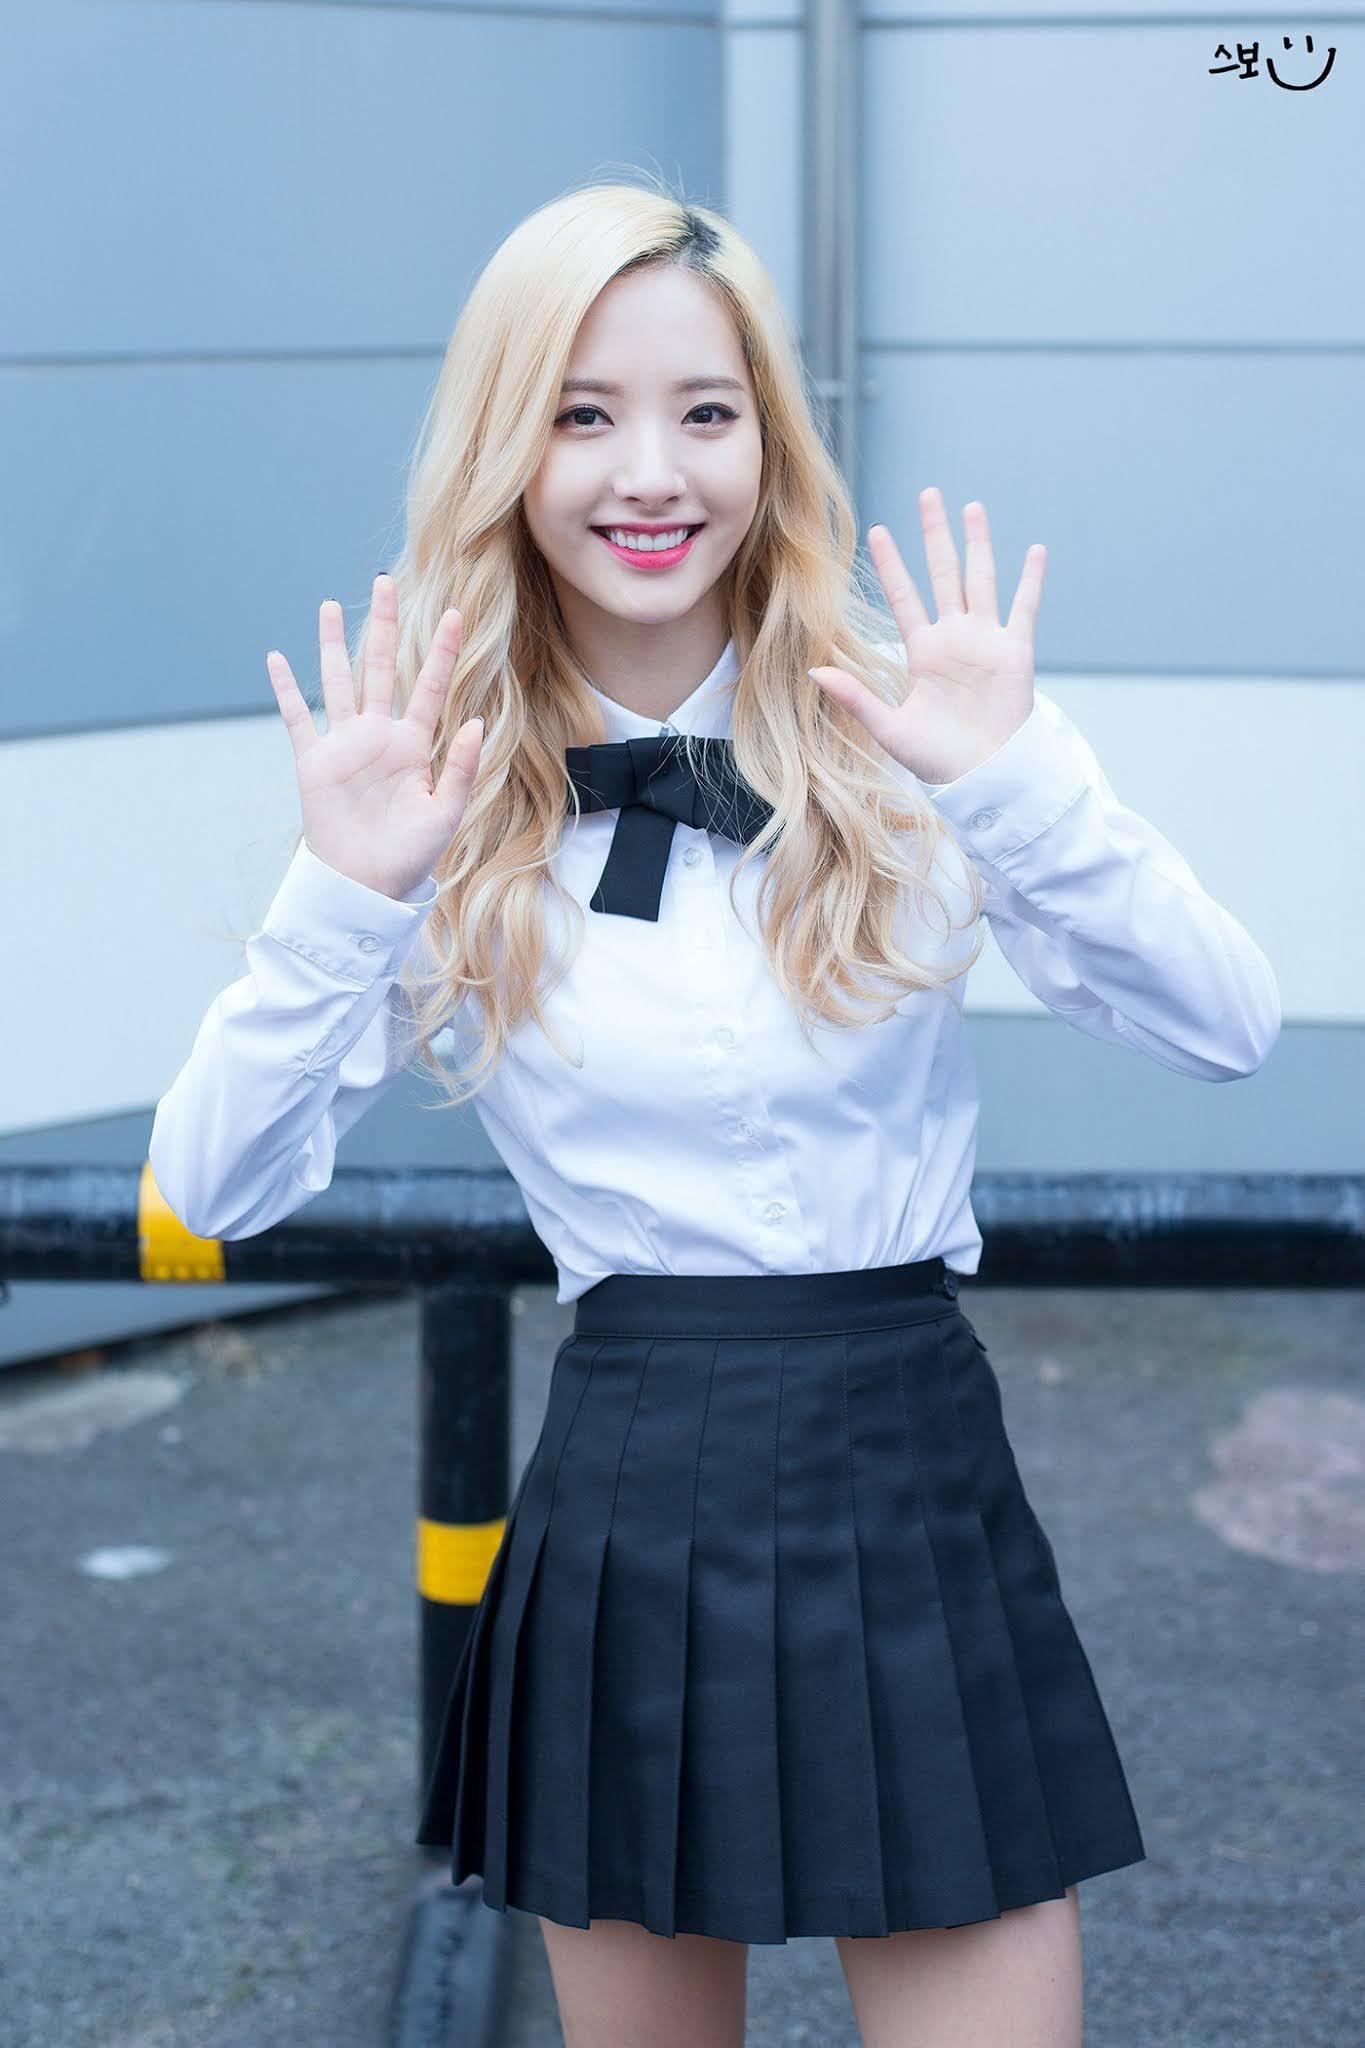 161130 WJSN - Daegu High School Final Year Student Support Event - 26p